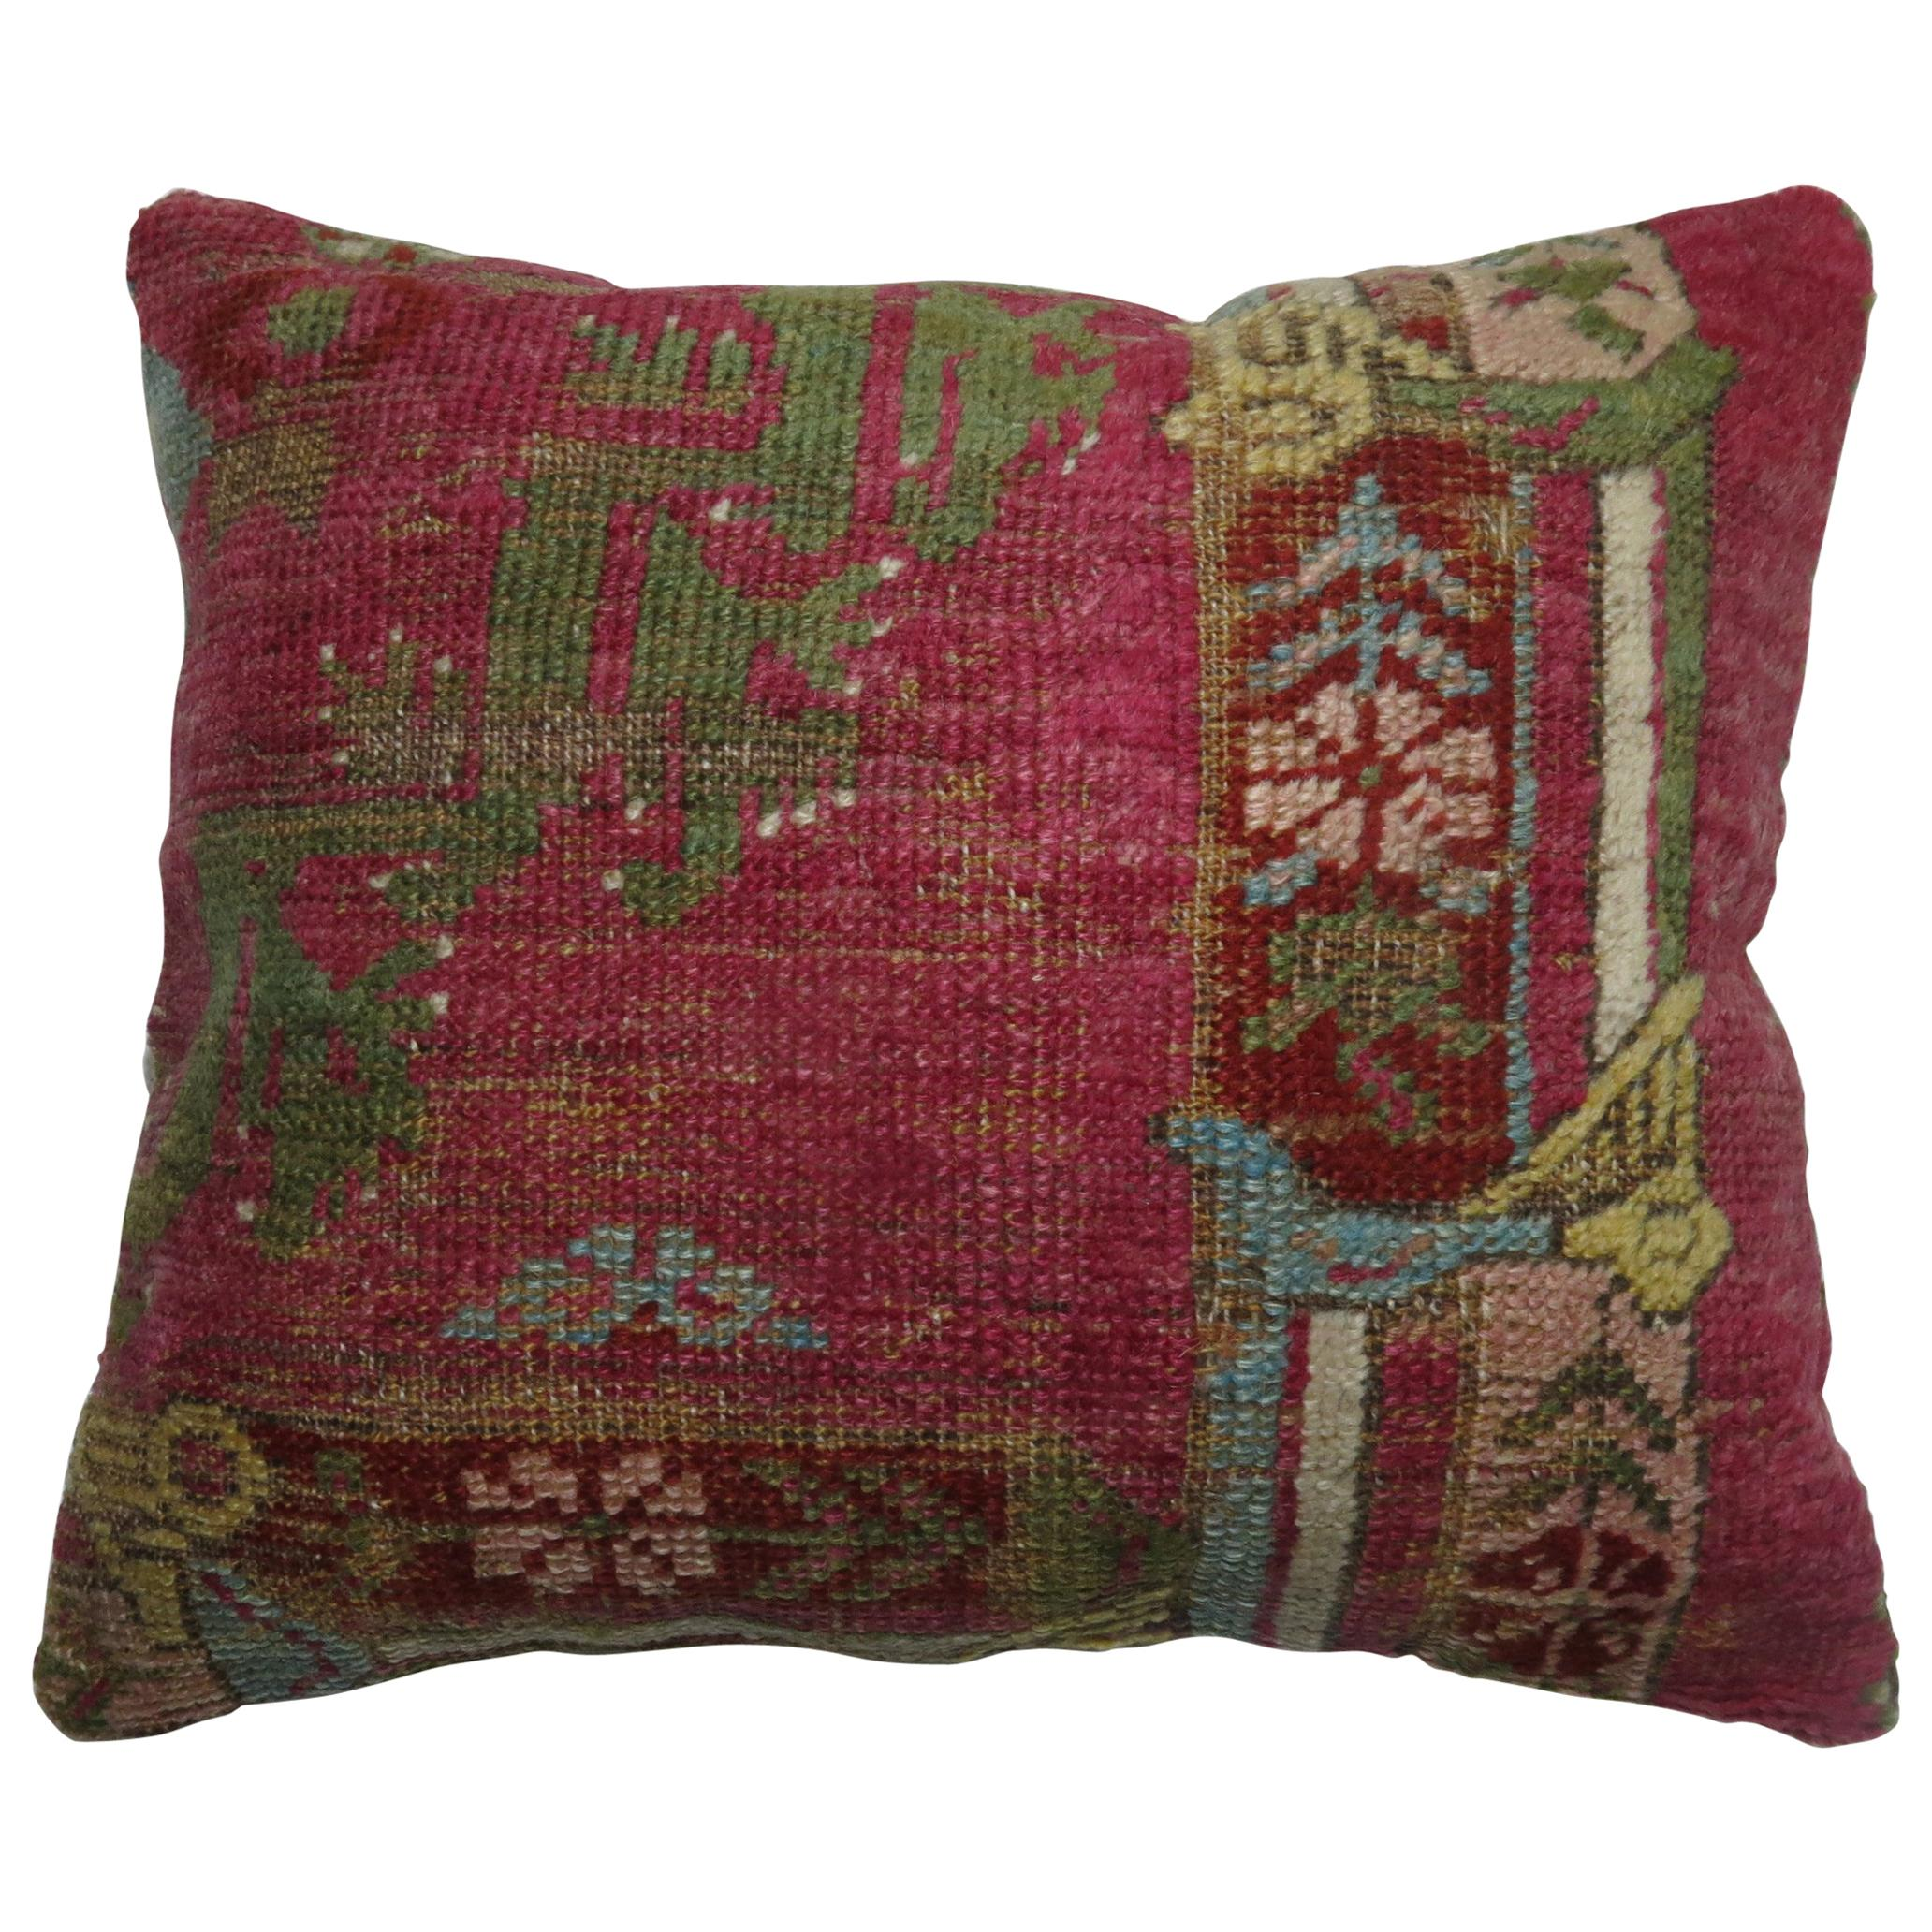 19th Century Turkish Ghiordes Rug Remnant Pillow